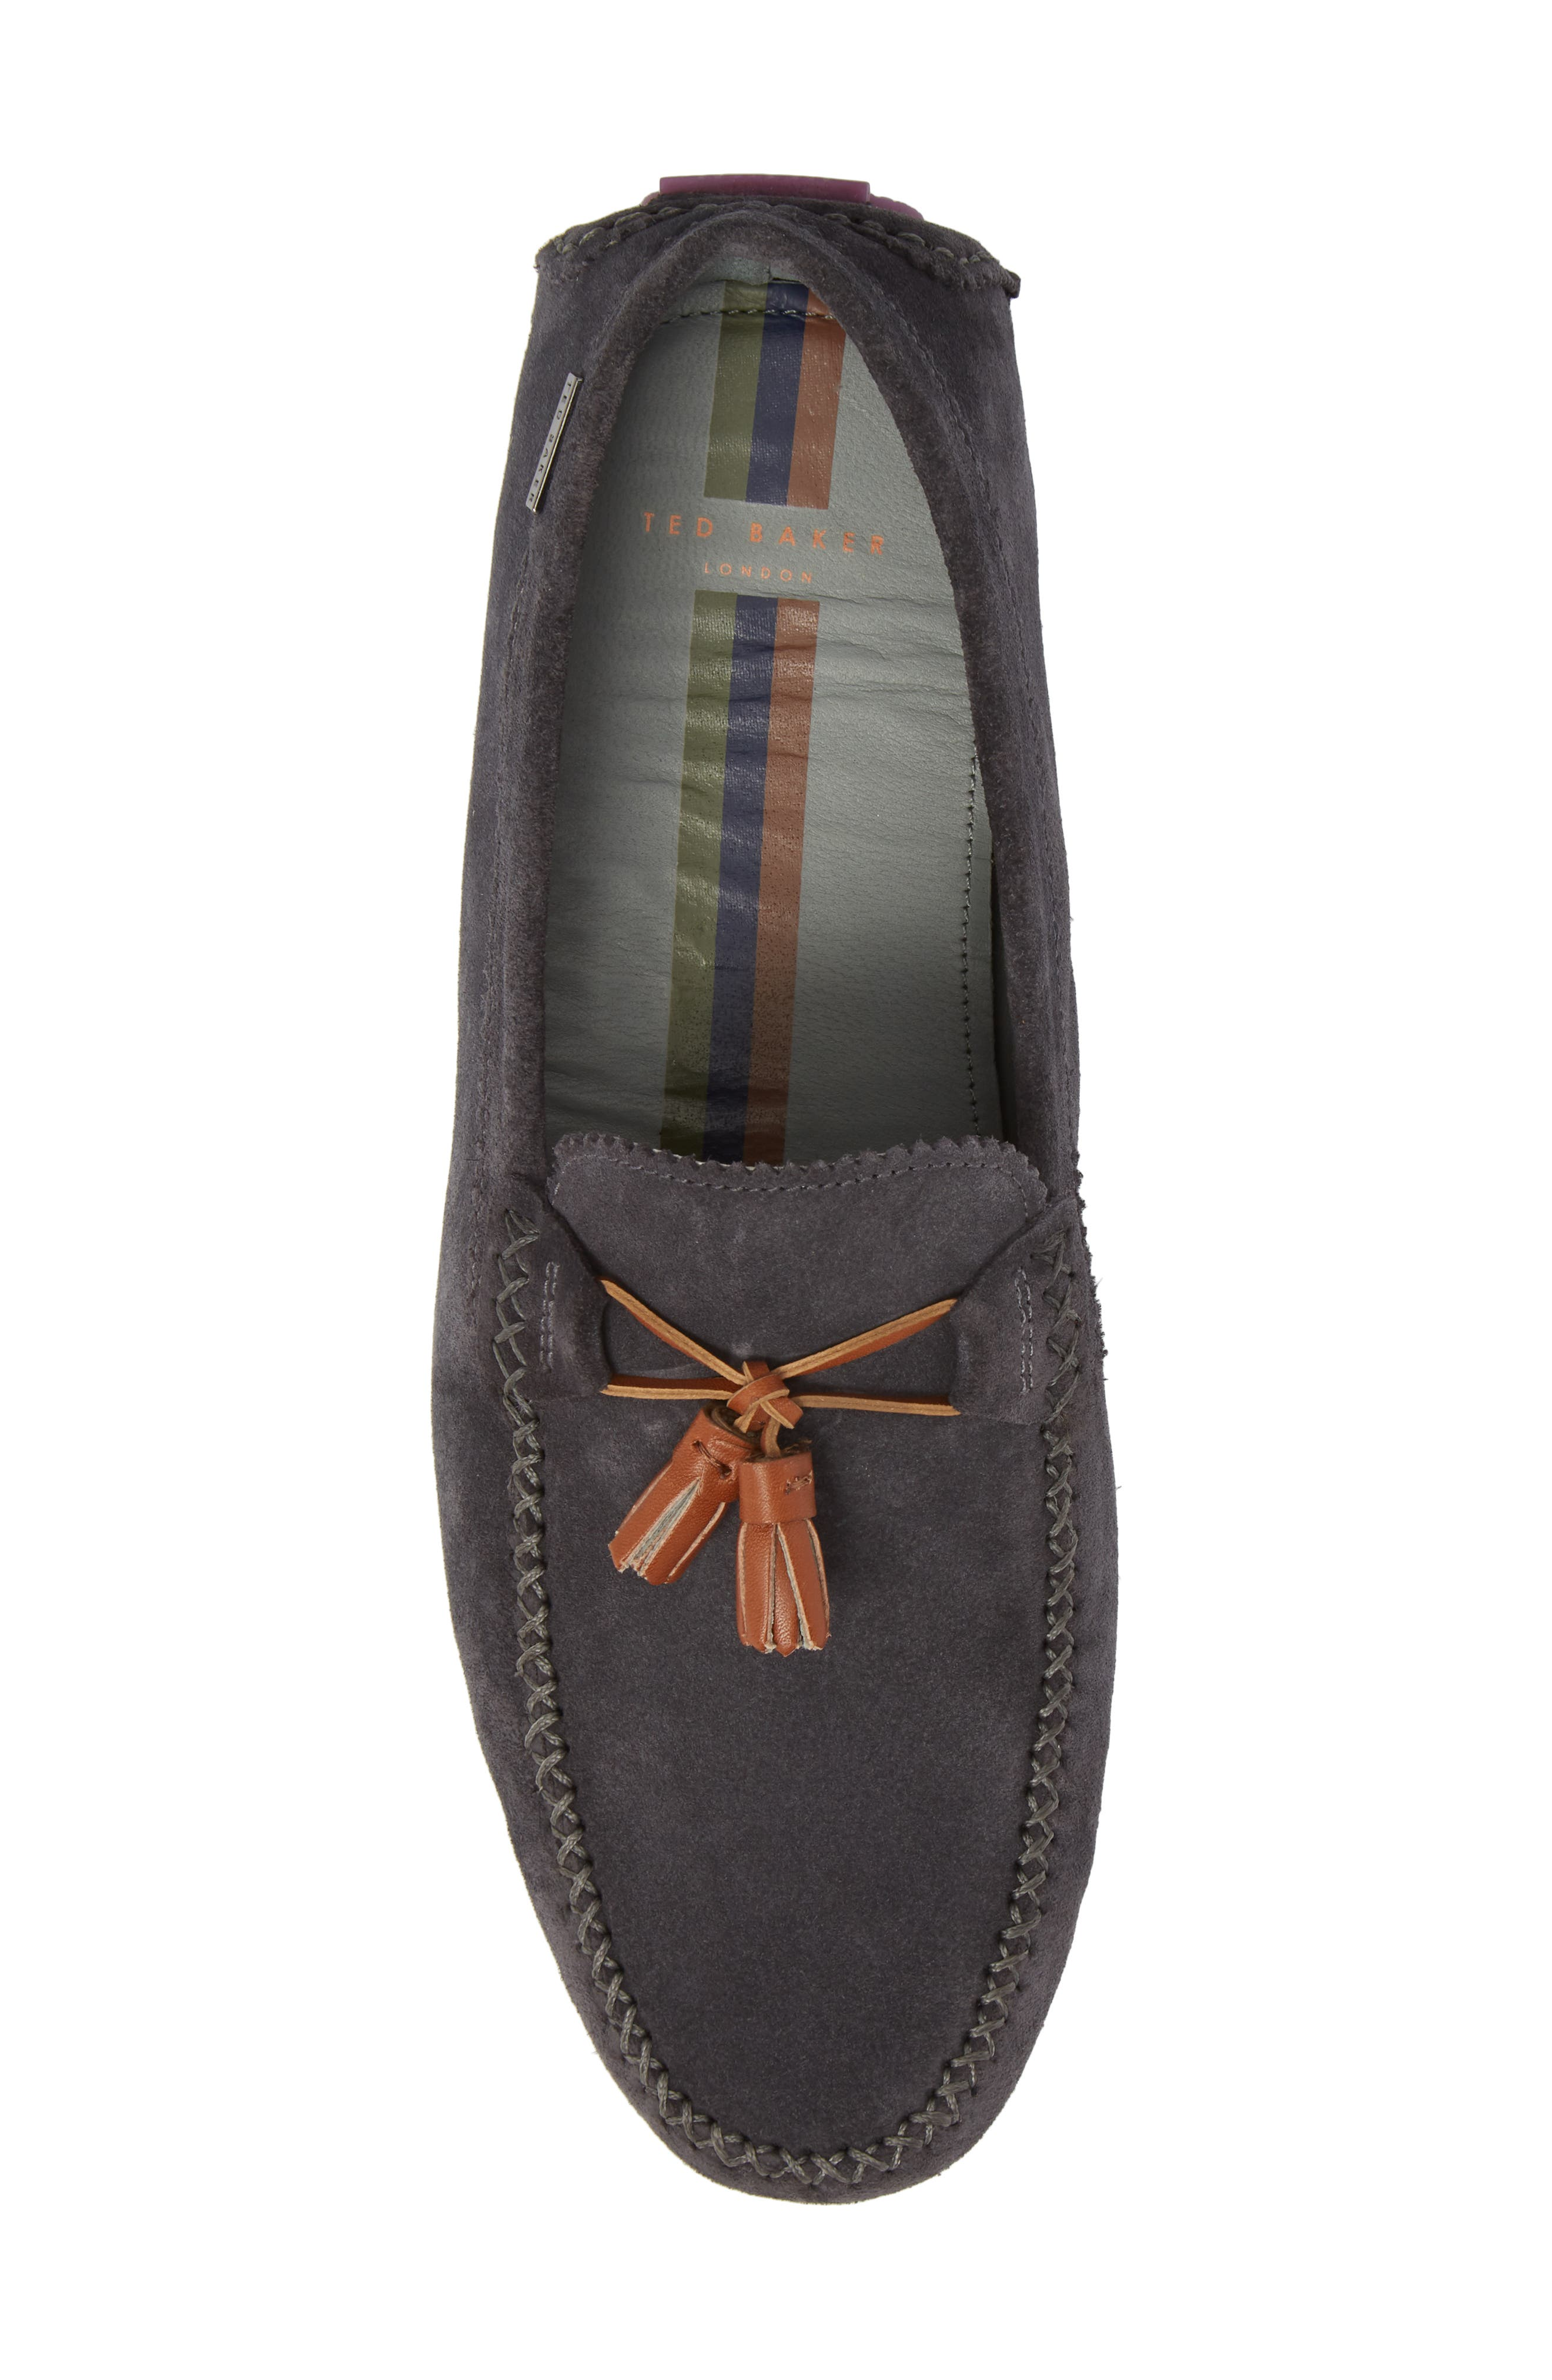 Urbonns Tasseled Driving Loafer,                             Alternate thumbnail 5, color,                             070